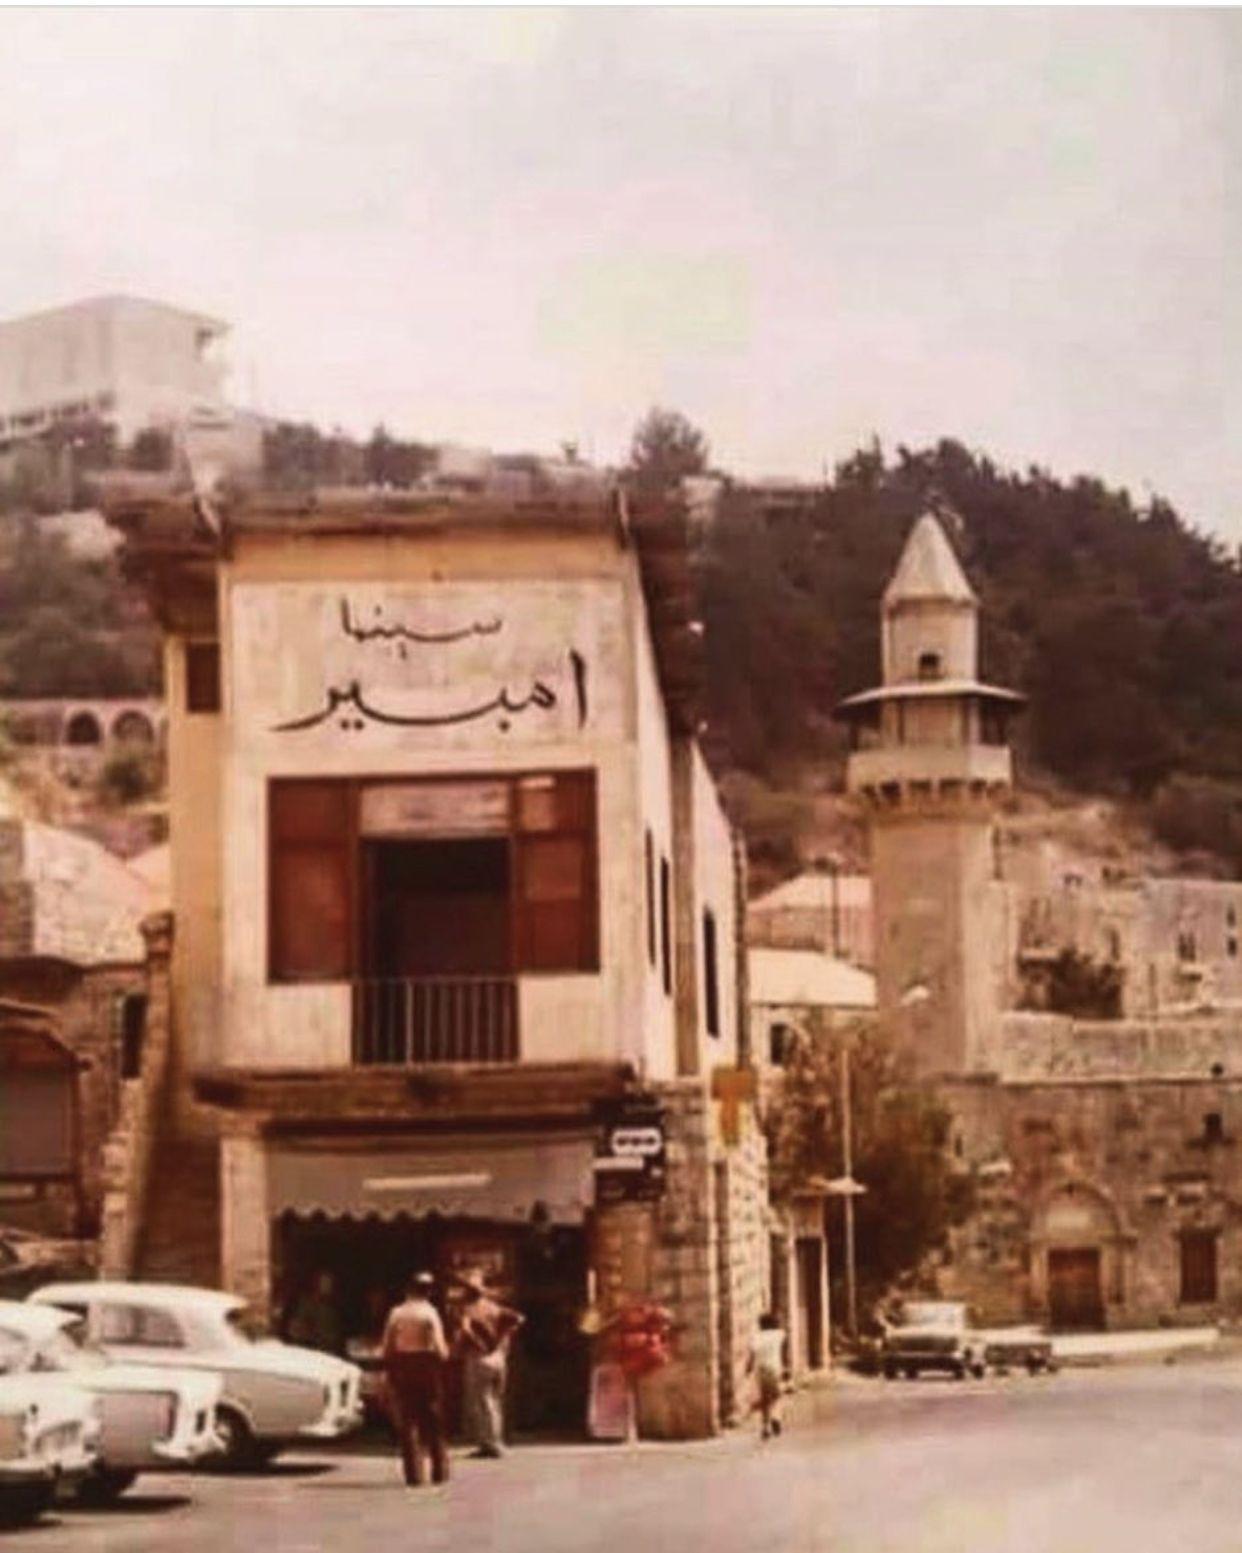 Deir el qatar 1972 beirut lebanon lebanon lebanon culture